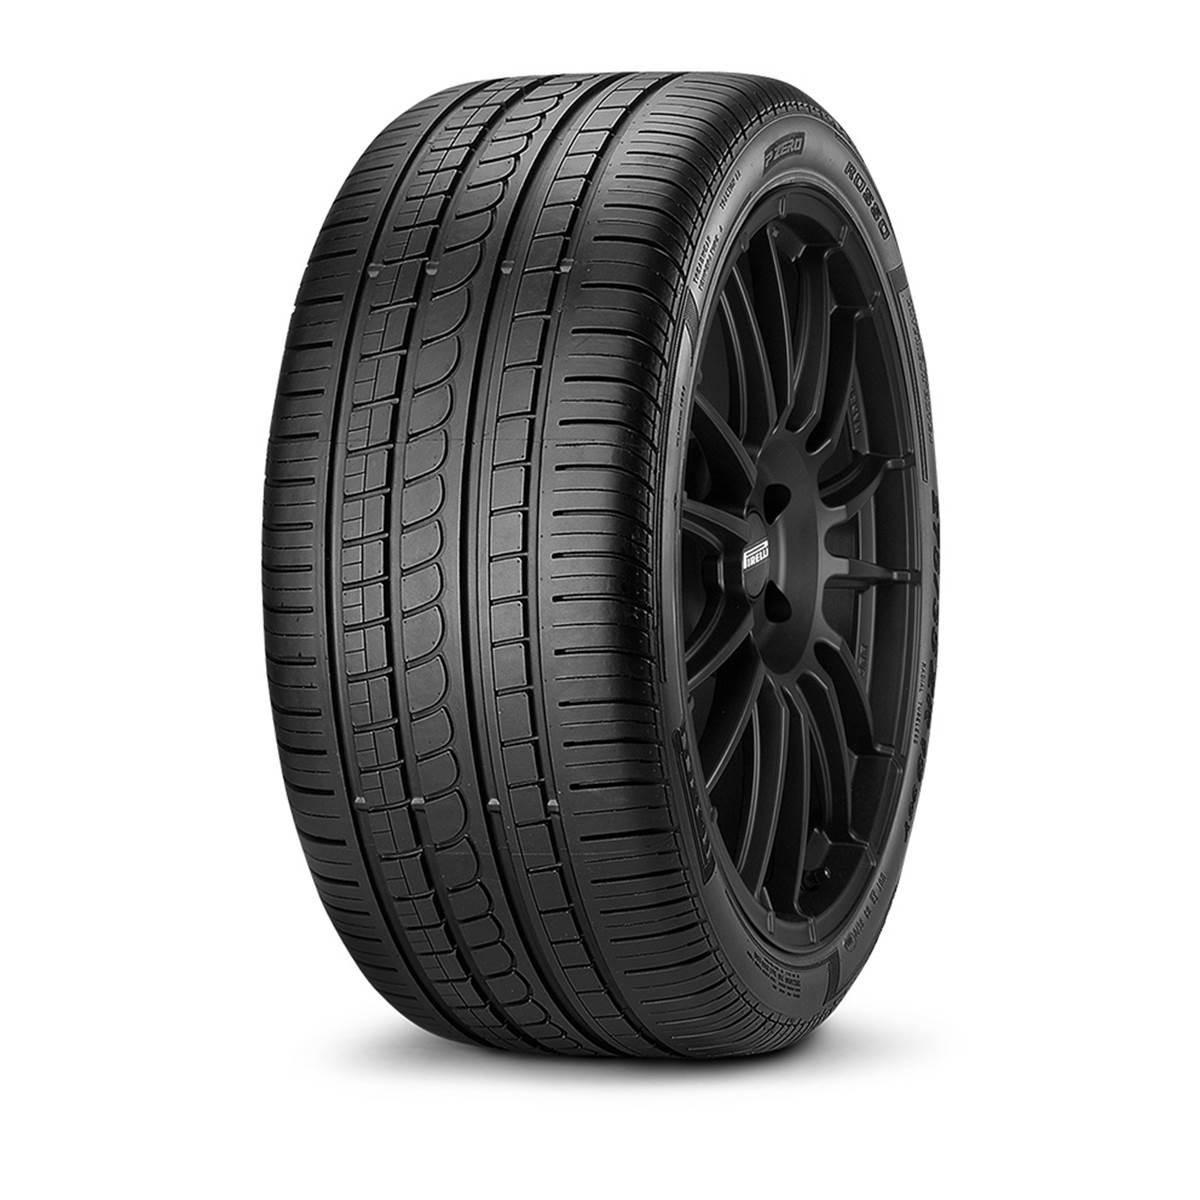 Pneu Pirelli 235/60R18 103V Pzero Rosso